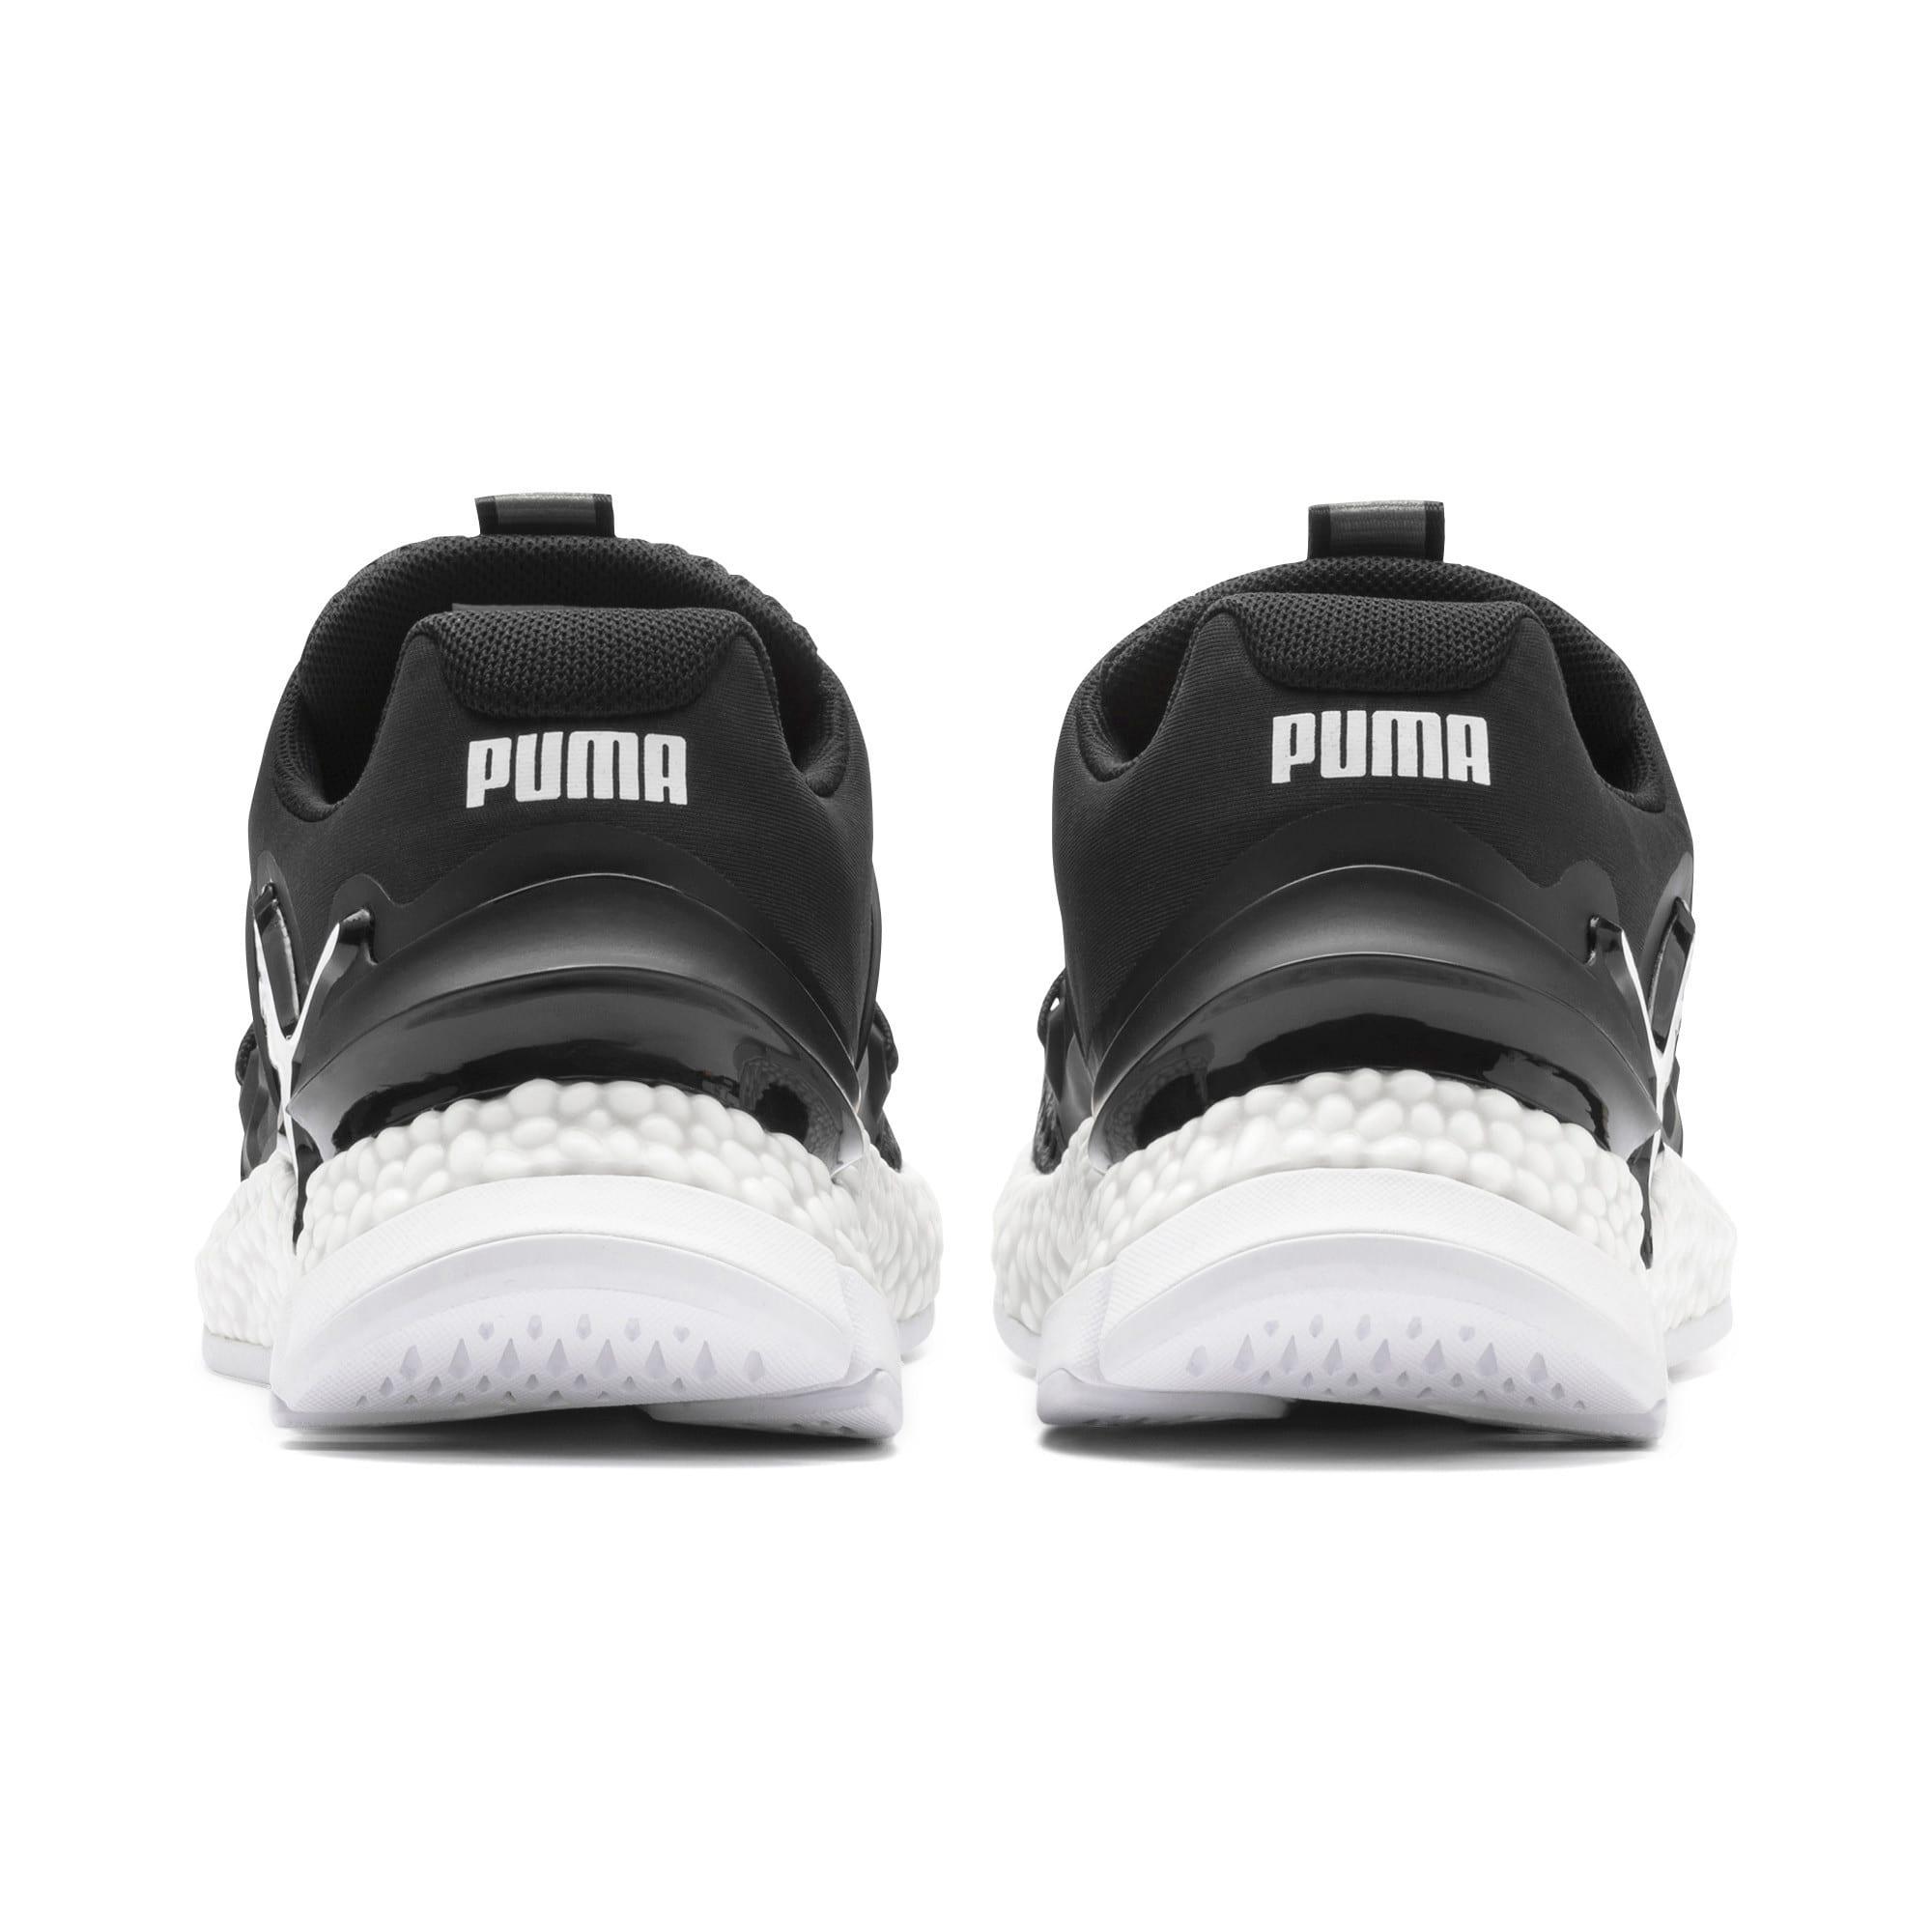 Thumbnail 4 of HYBRID Sky hardloopschoenen voor dames, Puma Black-Puma White, medium